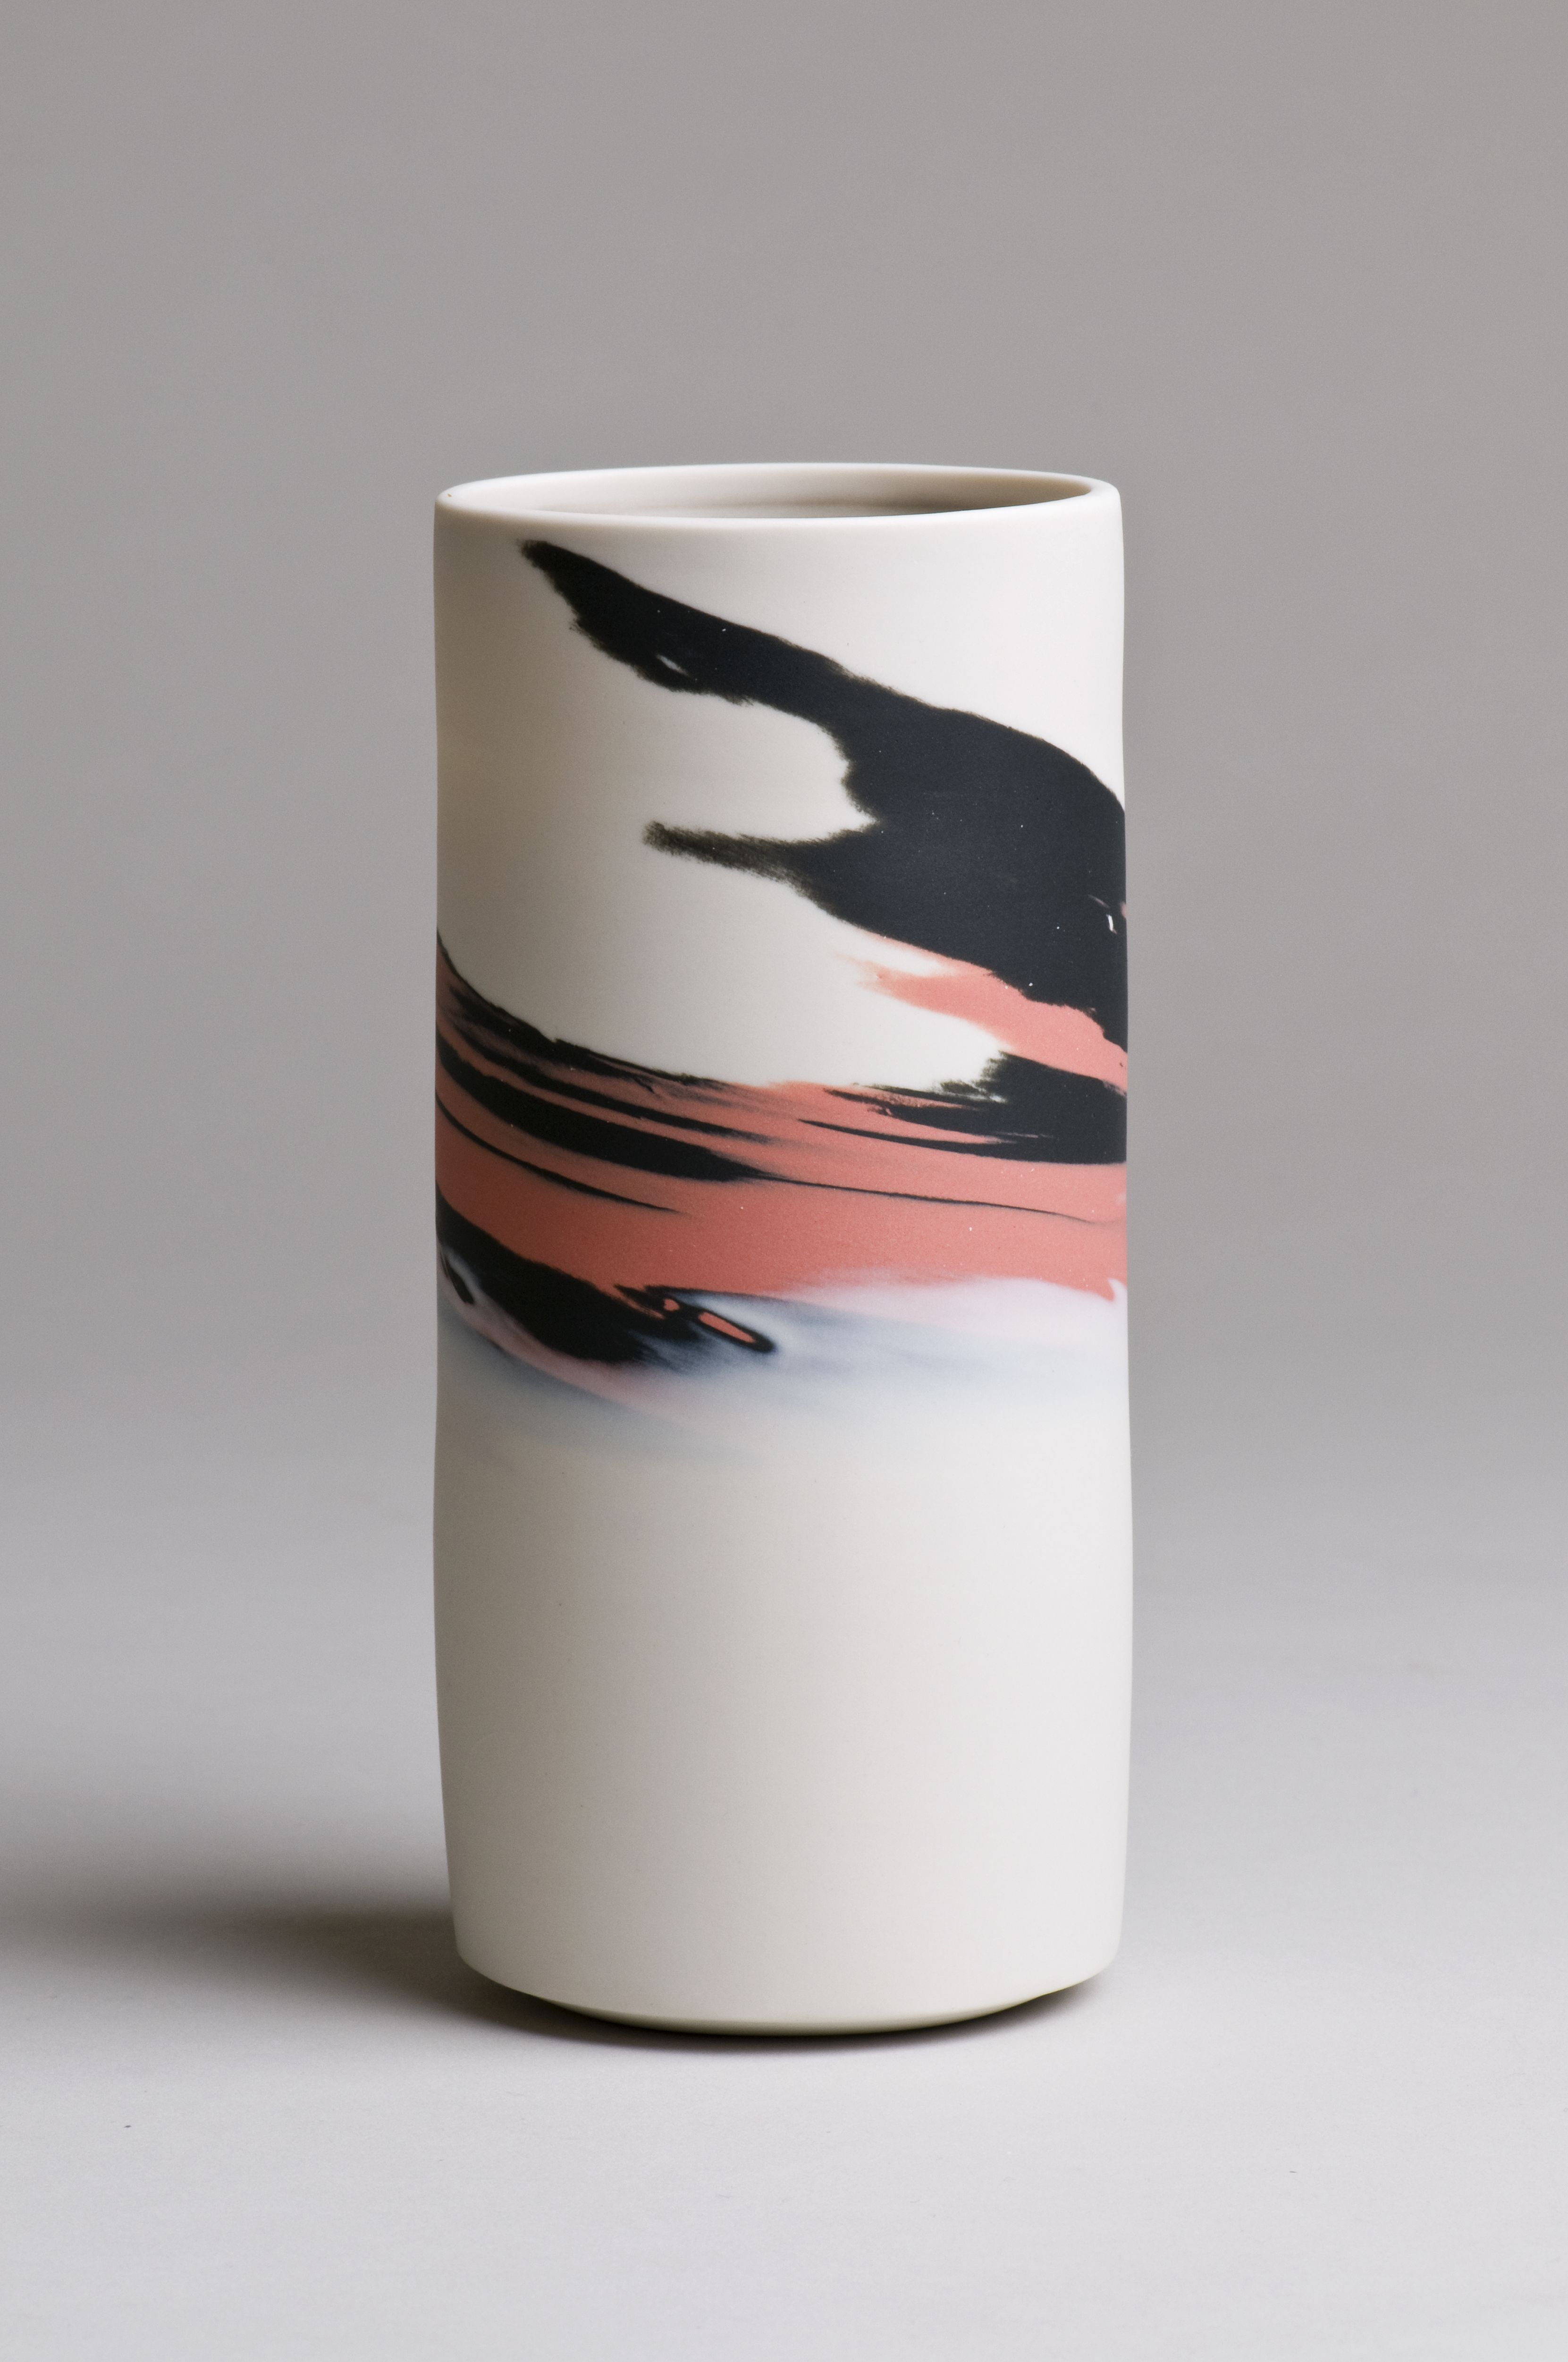 Agateware, polished porcelain